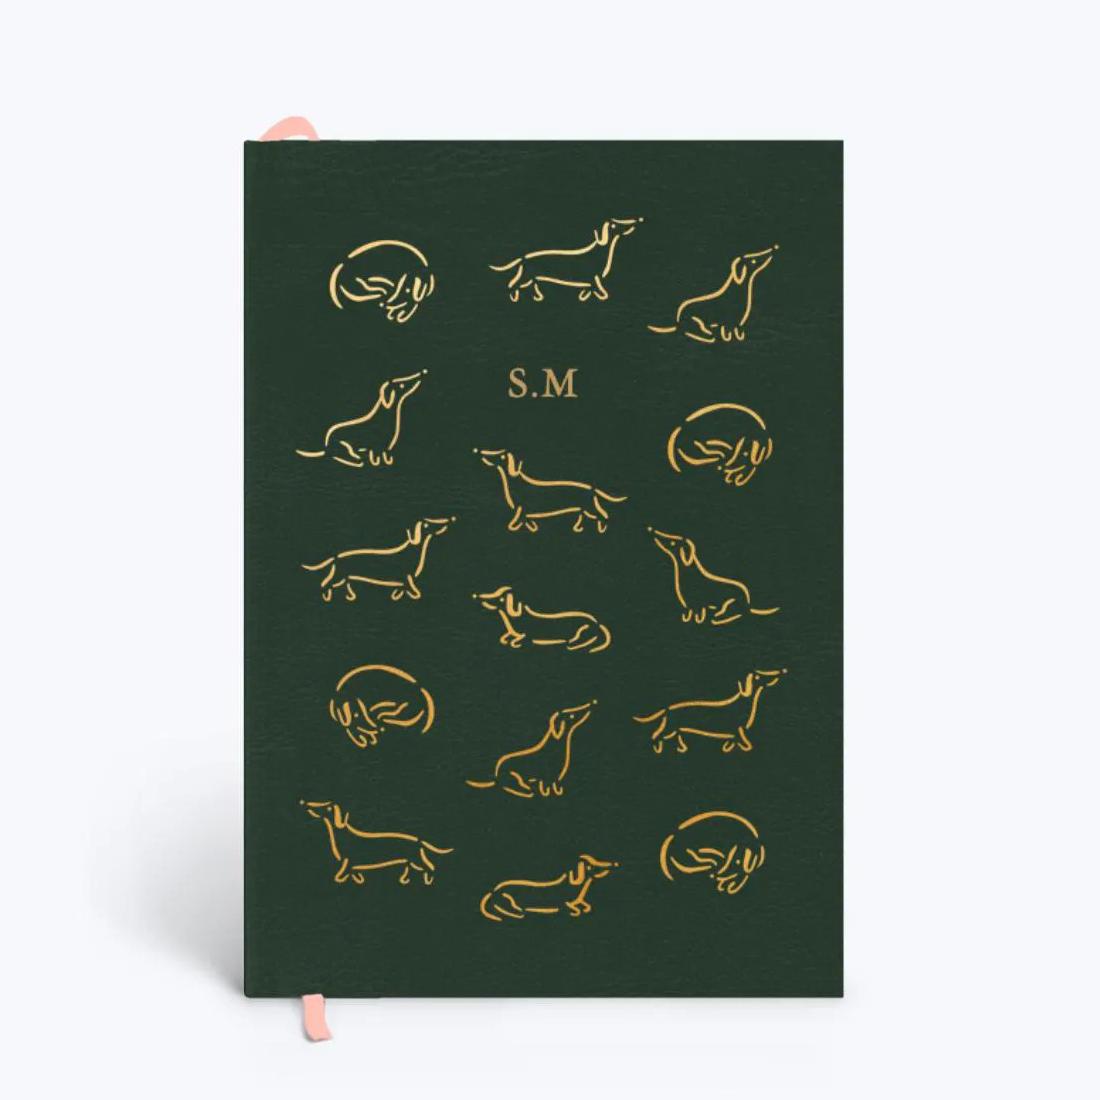 Papier Dachshund Leather Notebook